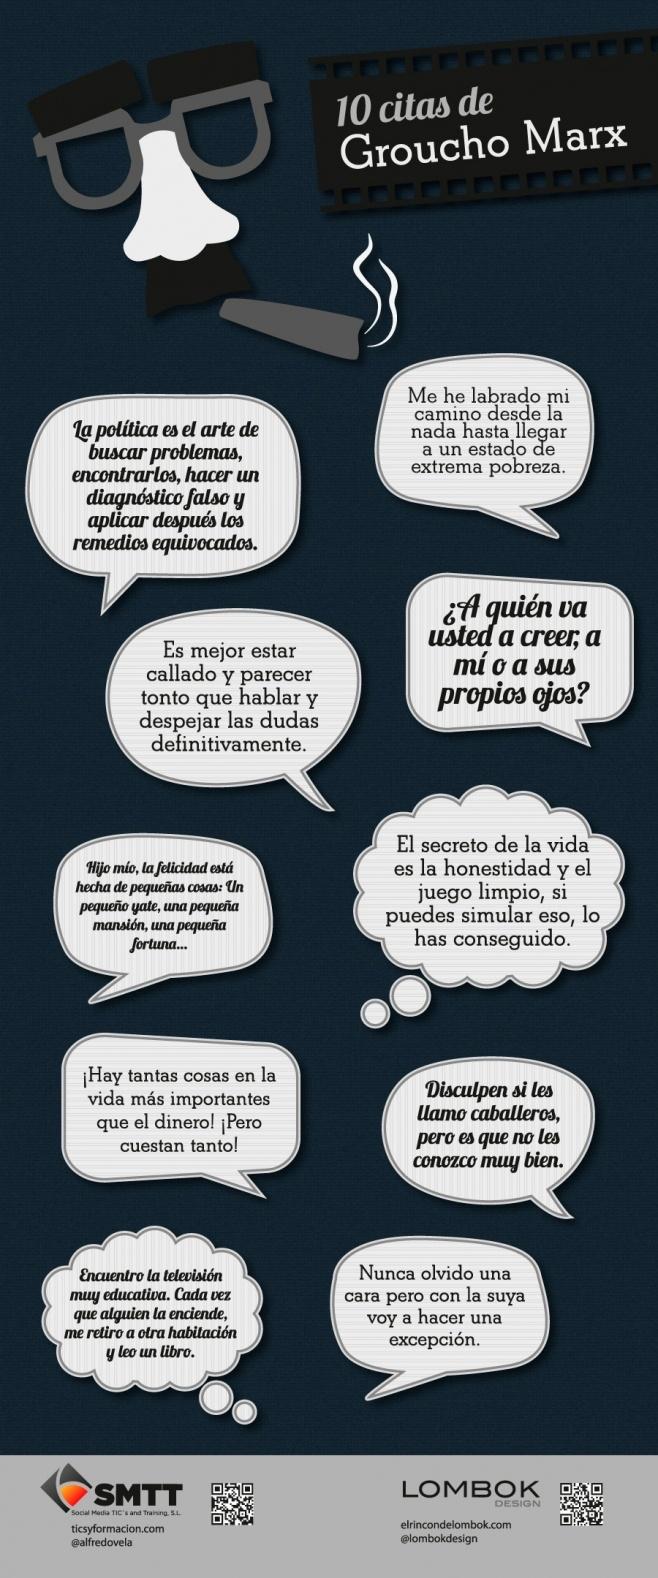 10 frases célebres de Groucho Marx #infografia #infographic #citas#quotes